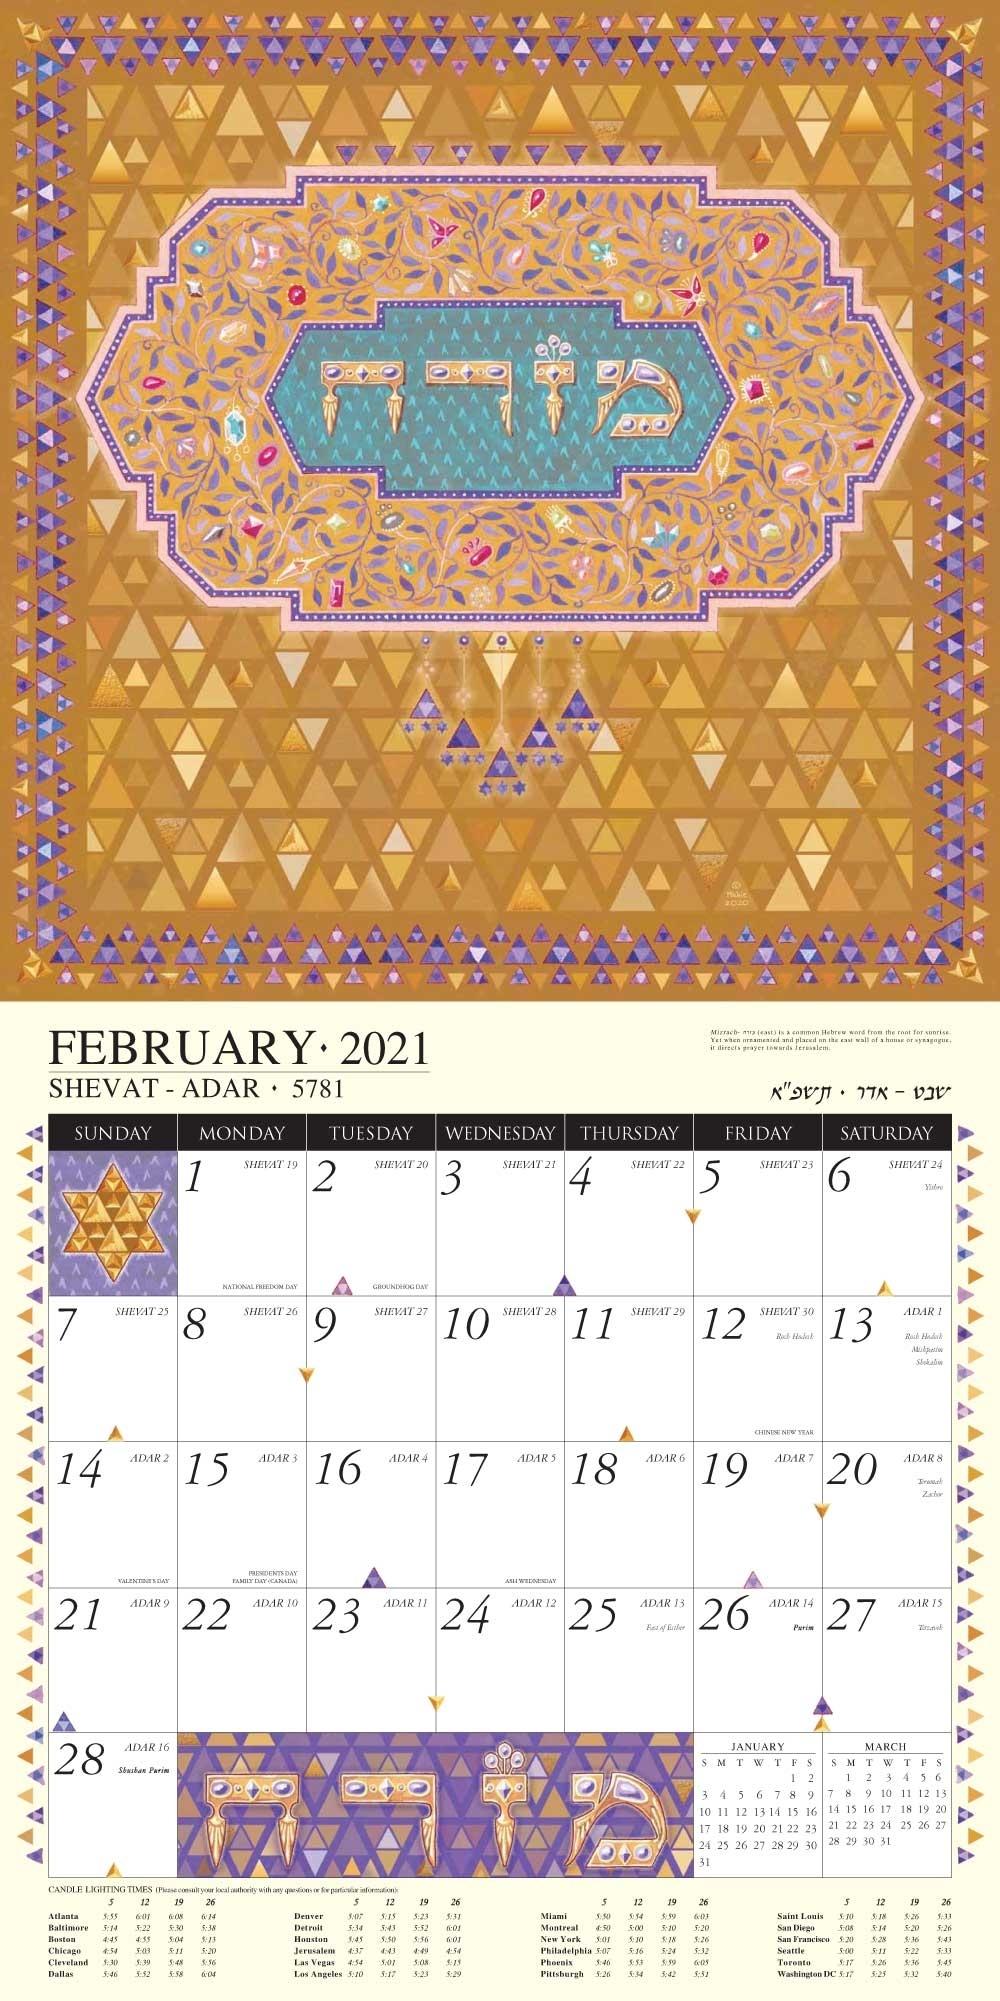 Jewish Art Calendar 2021 By Mickie - Caspi Cards & Art August 2021 Jewish Calendar